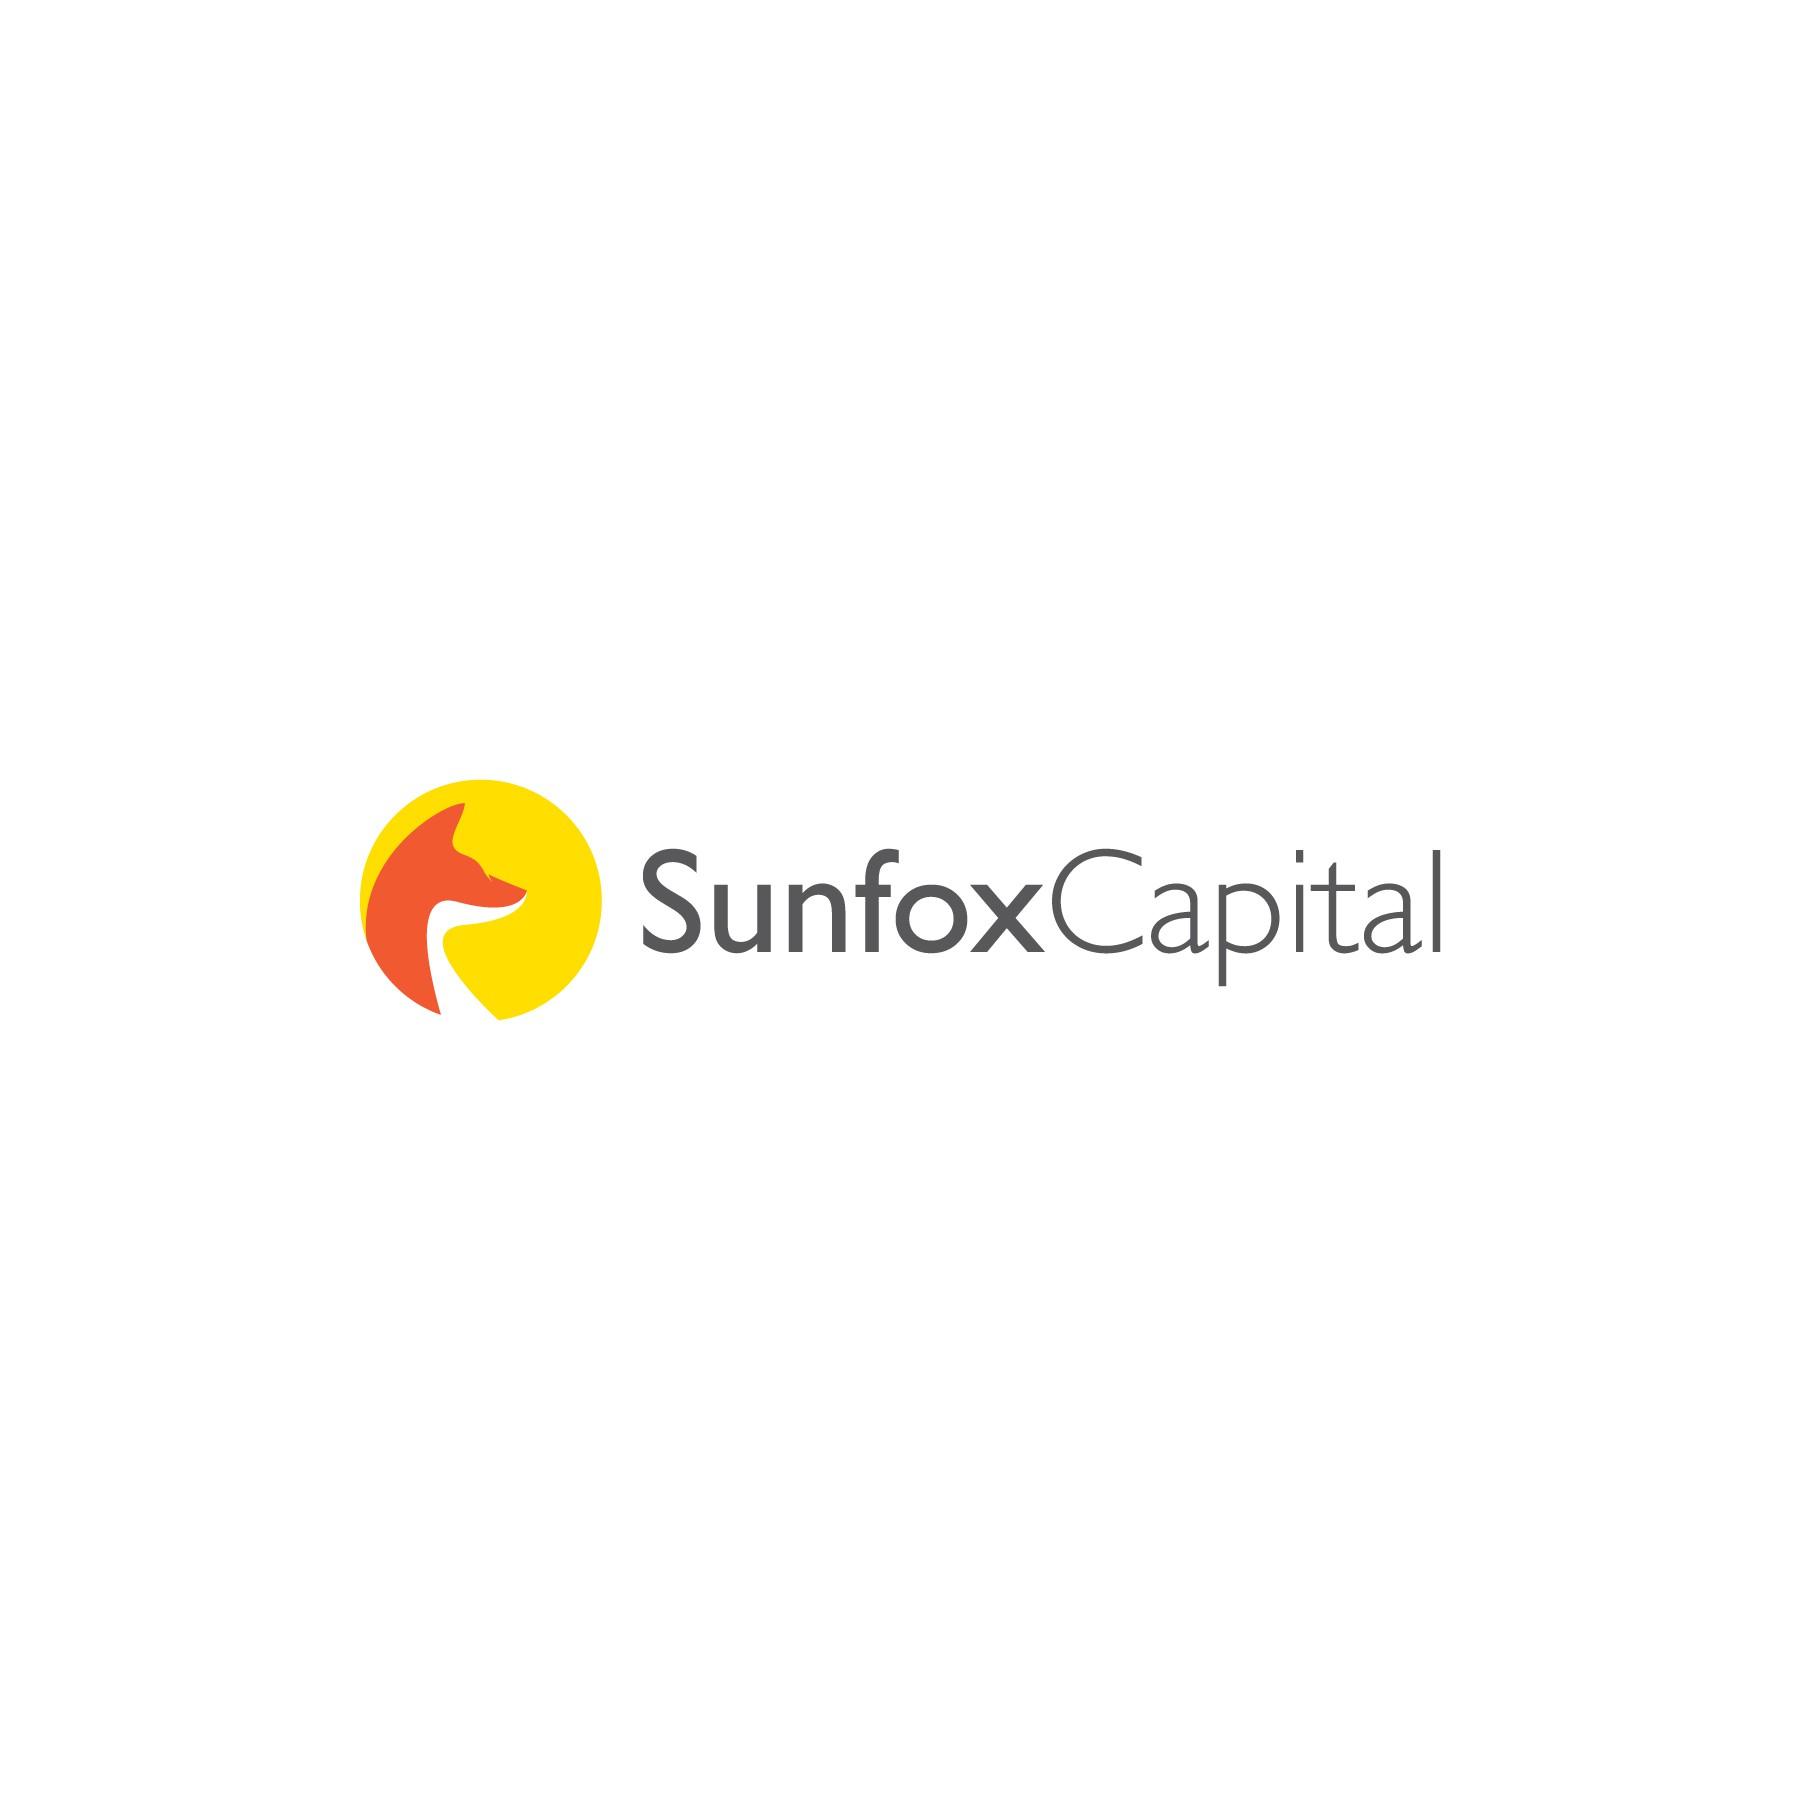 Design simple, powerful logo for solar finance company: Sunfox